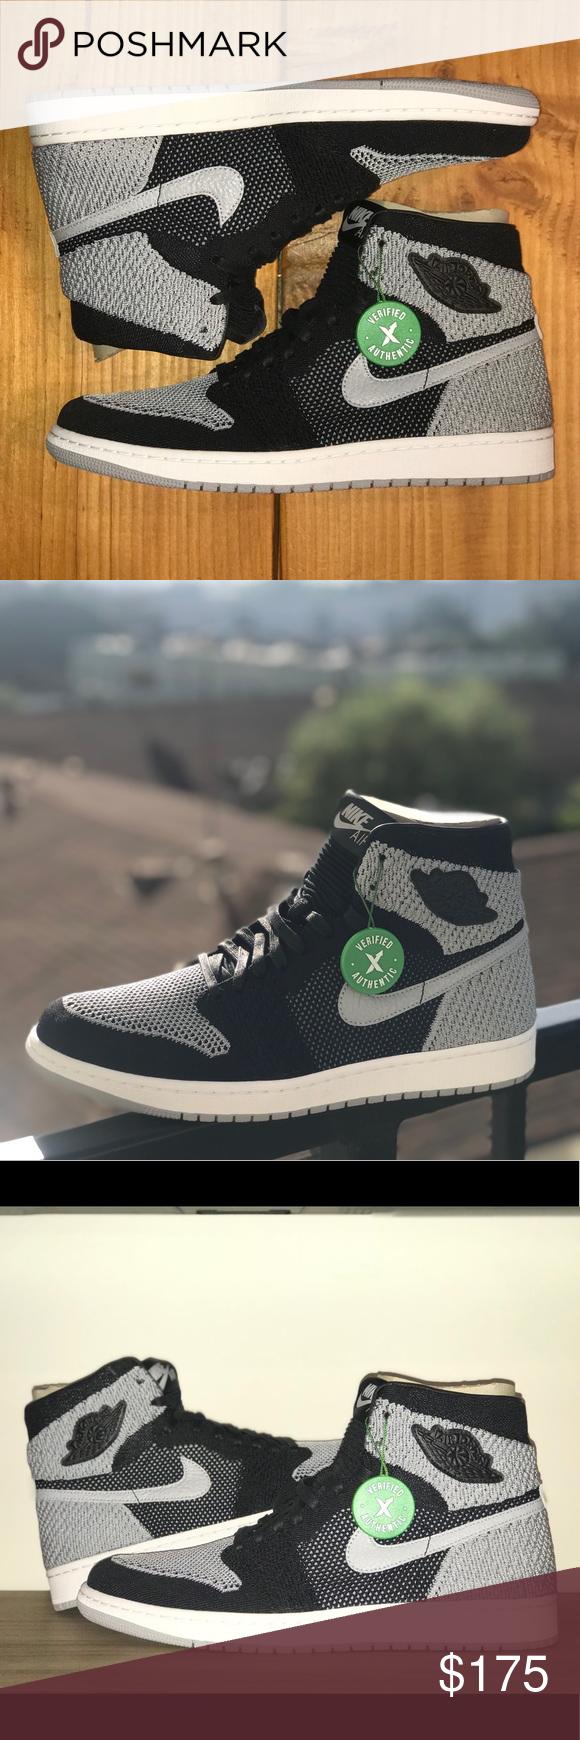 "cheaper e6e43 c9a0b Jordan 1 Retro High Flyknit ""Shadow"" Men s Jordan 1 Retro High Flyknit "" Shadow"" Released 1.13.18 Retail  180 Deadstock Brand New StockX Verified  Nike Shoes ..."